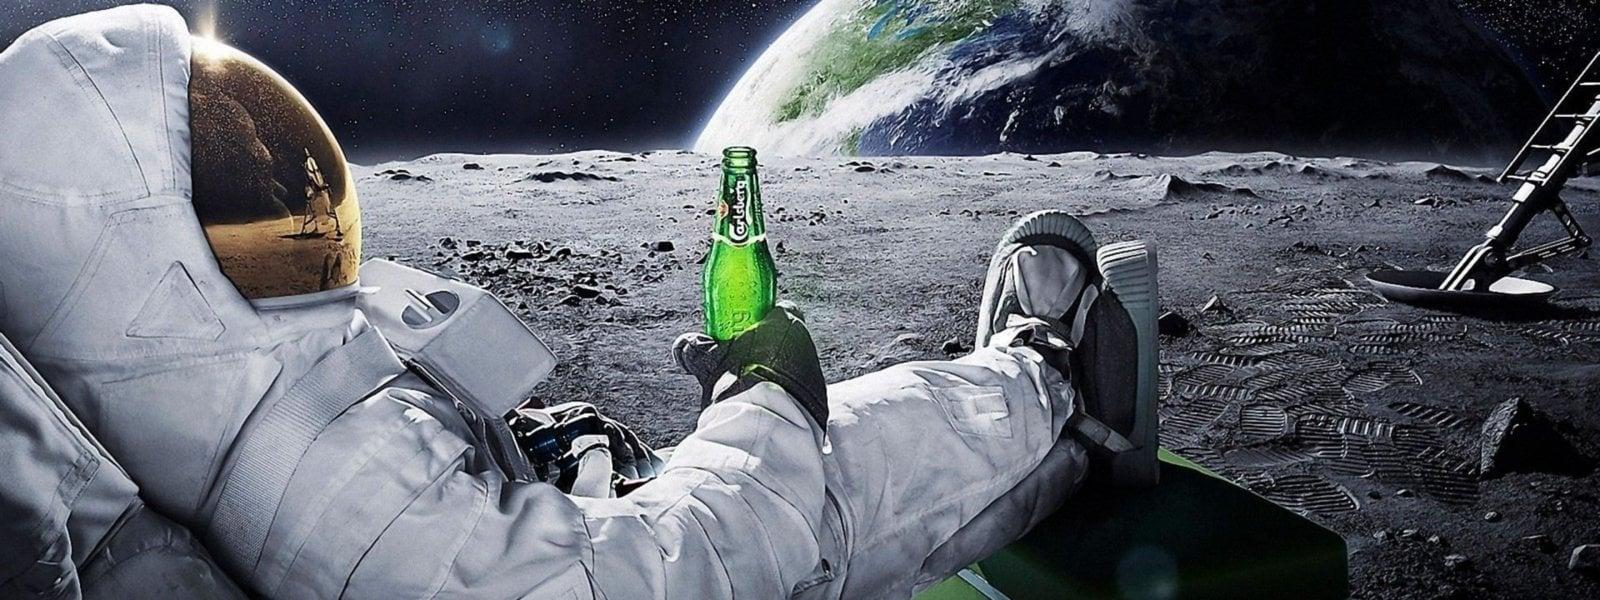 Carlsberg-on-moon-1200x3200.jpg